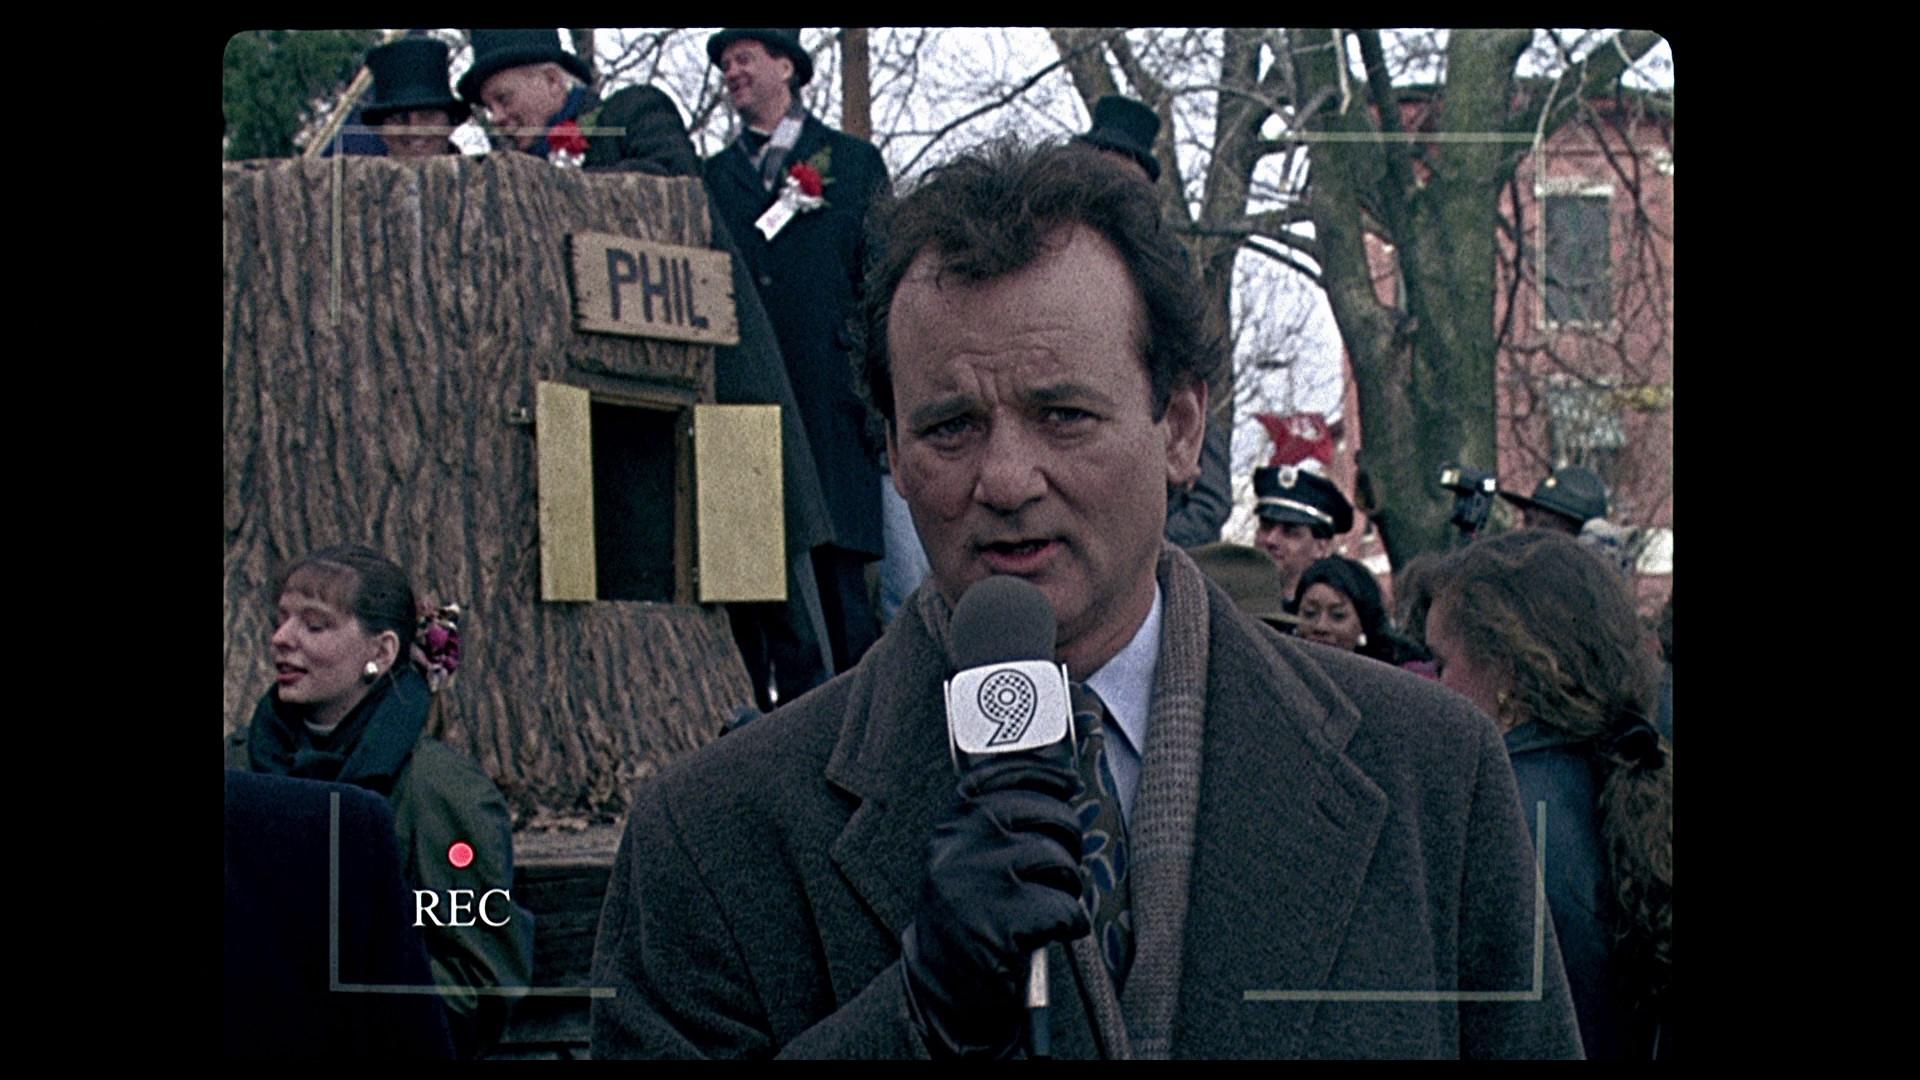 Groundhog Day HD Wallpaper Background Image 1920x1080 ID 1920x1080